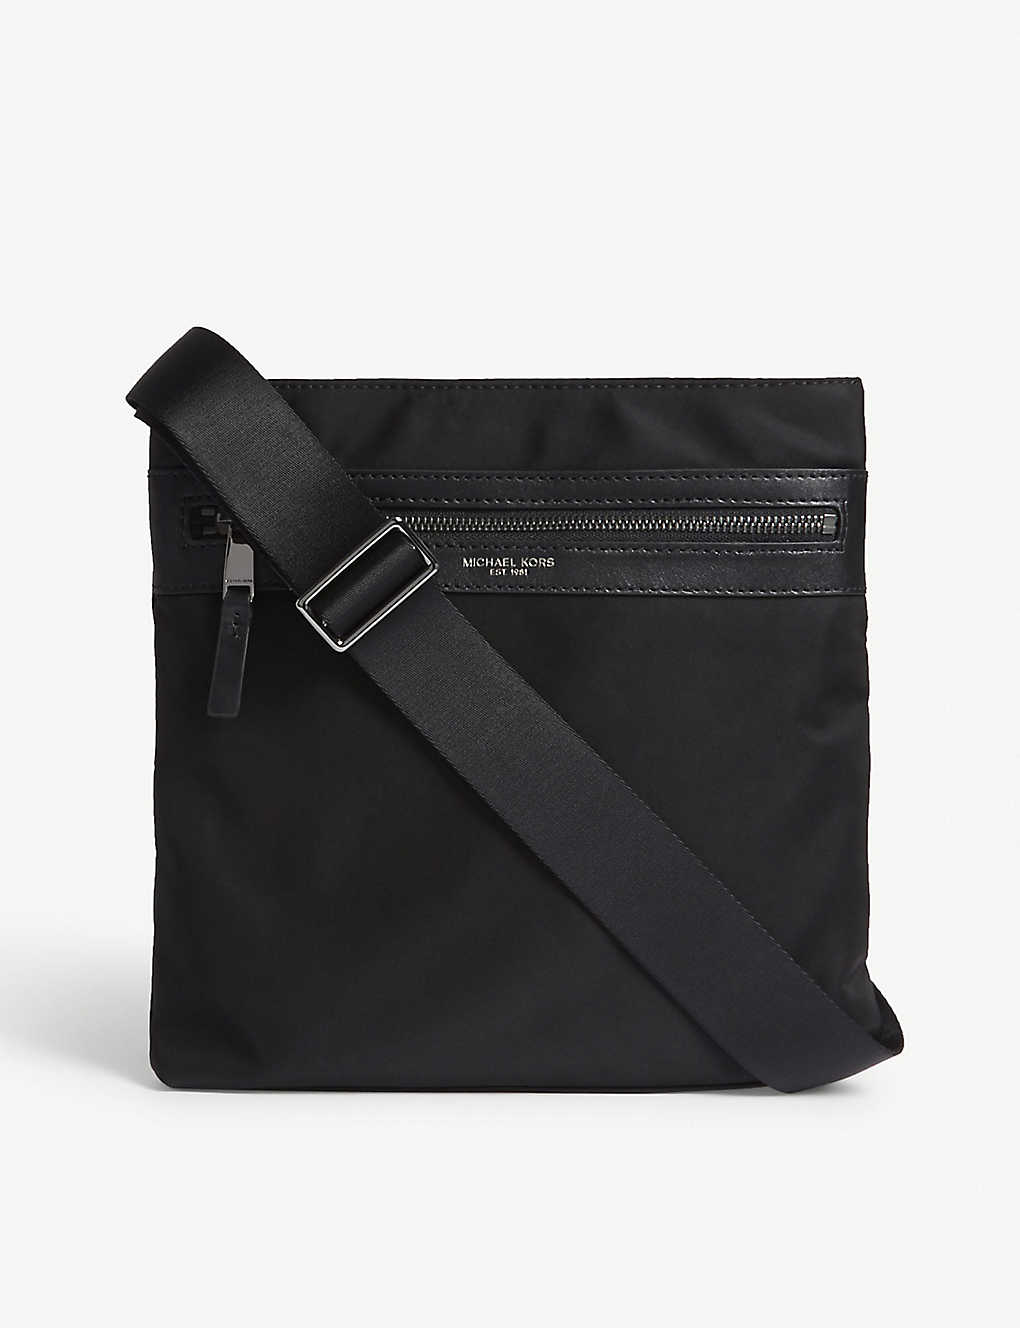 09dce725e19b MICHAEL KORS - Kent nylon cross-body bag | Selfridges.com